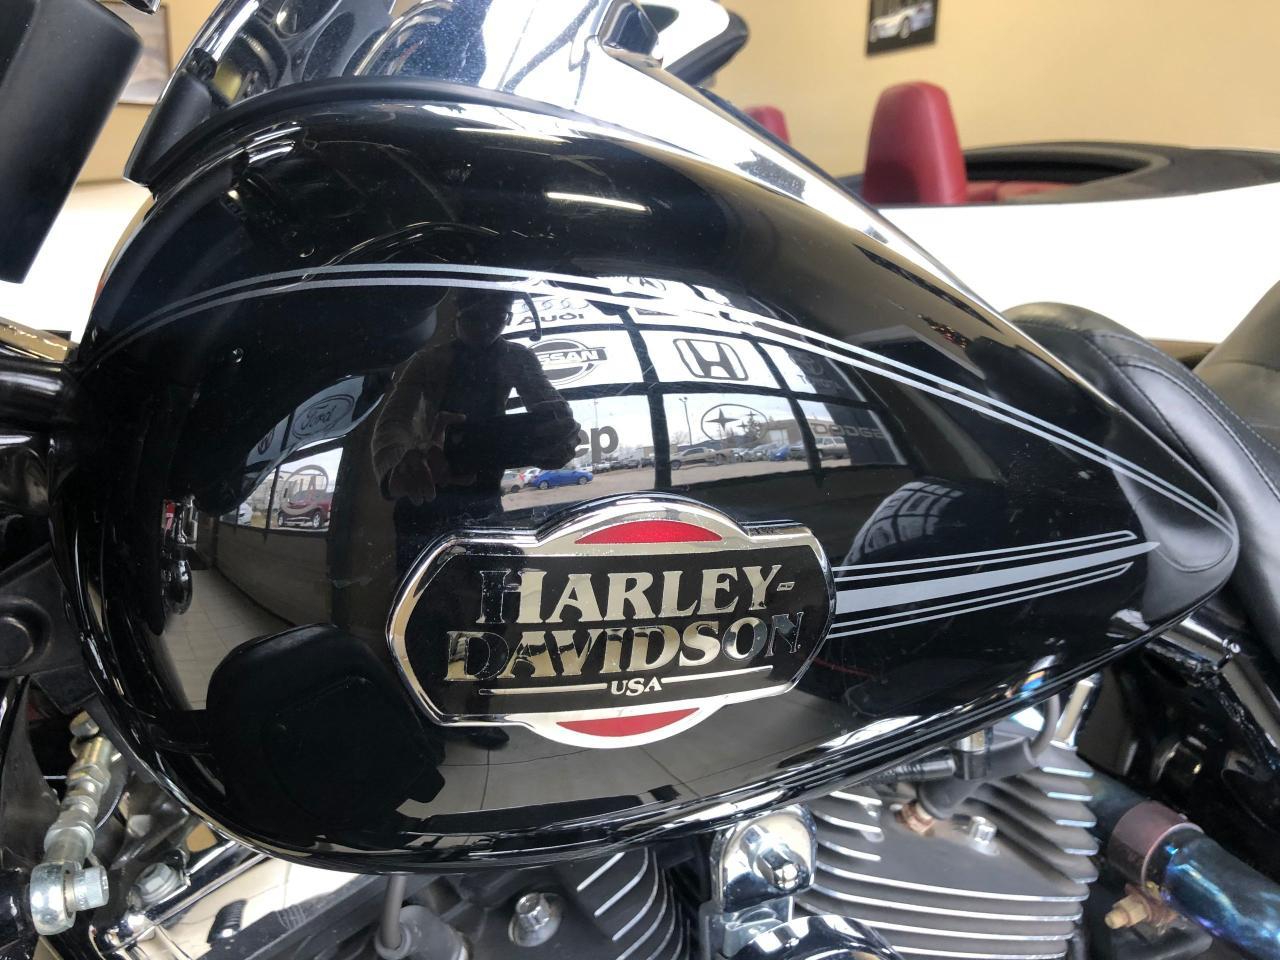 2008 Harley-Davidson ULTRA CLASSIC